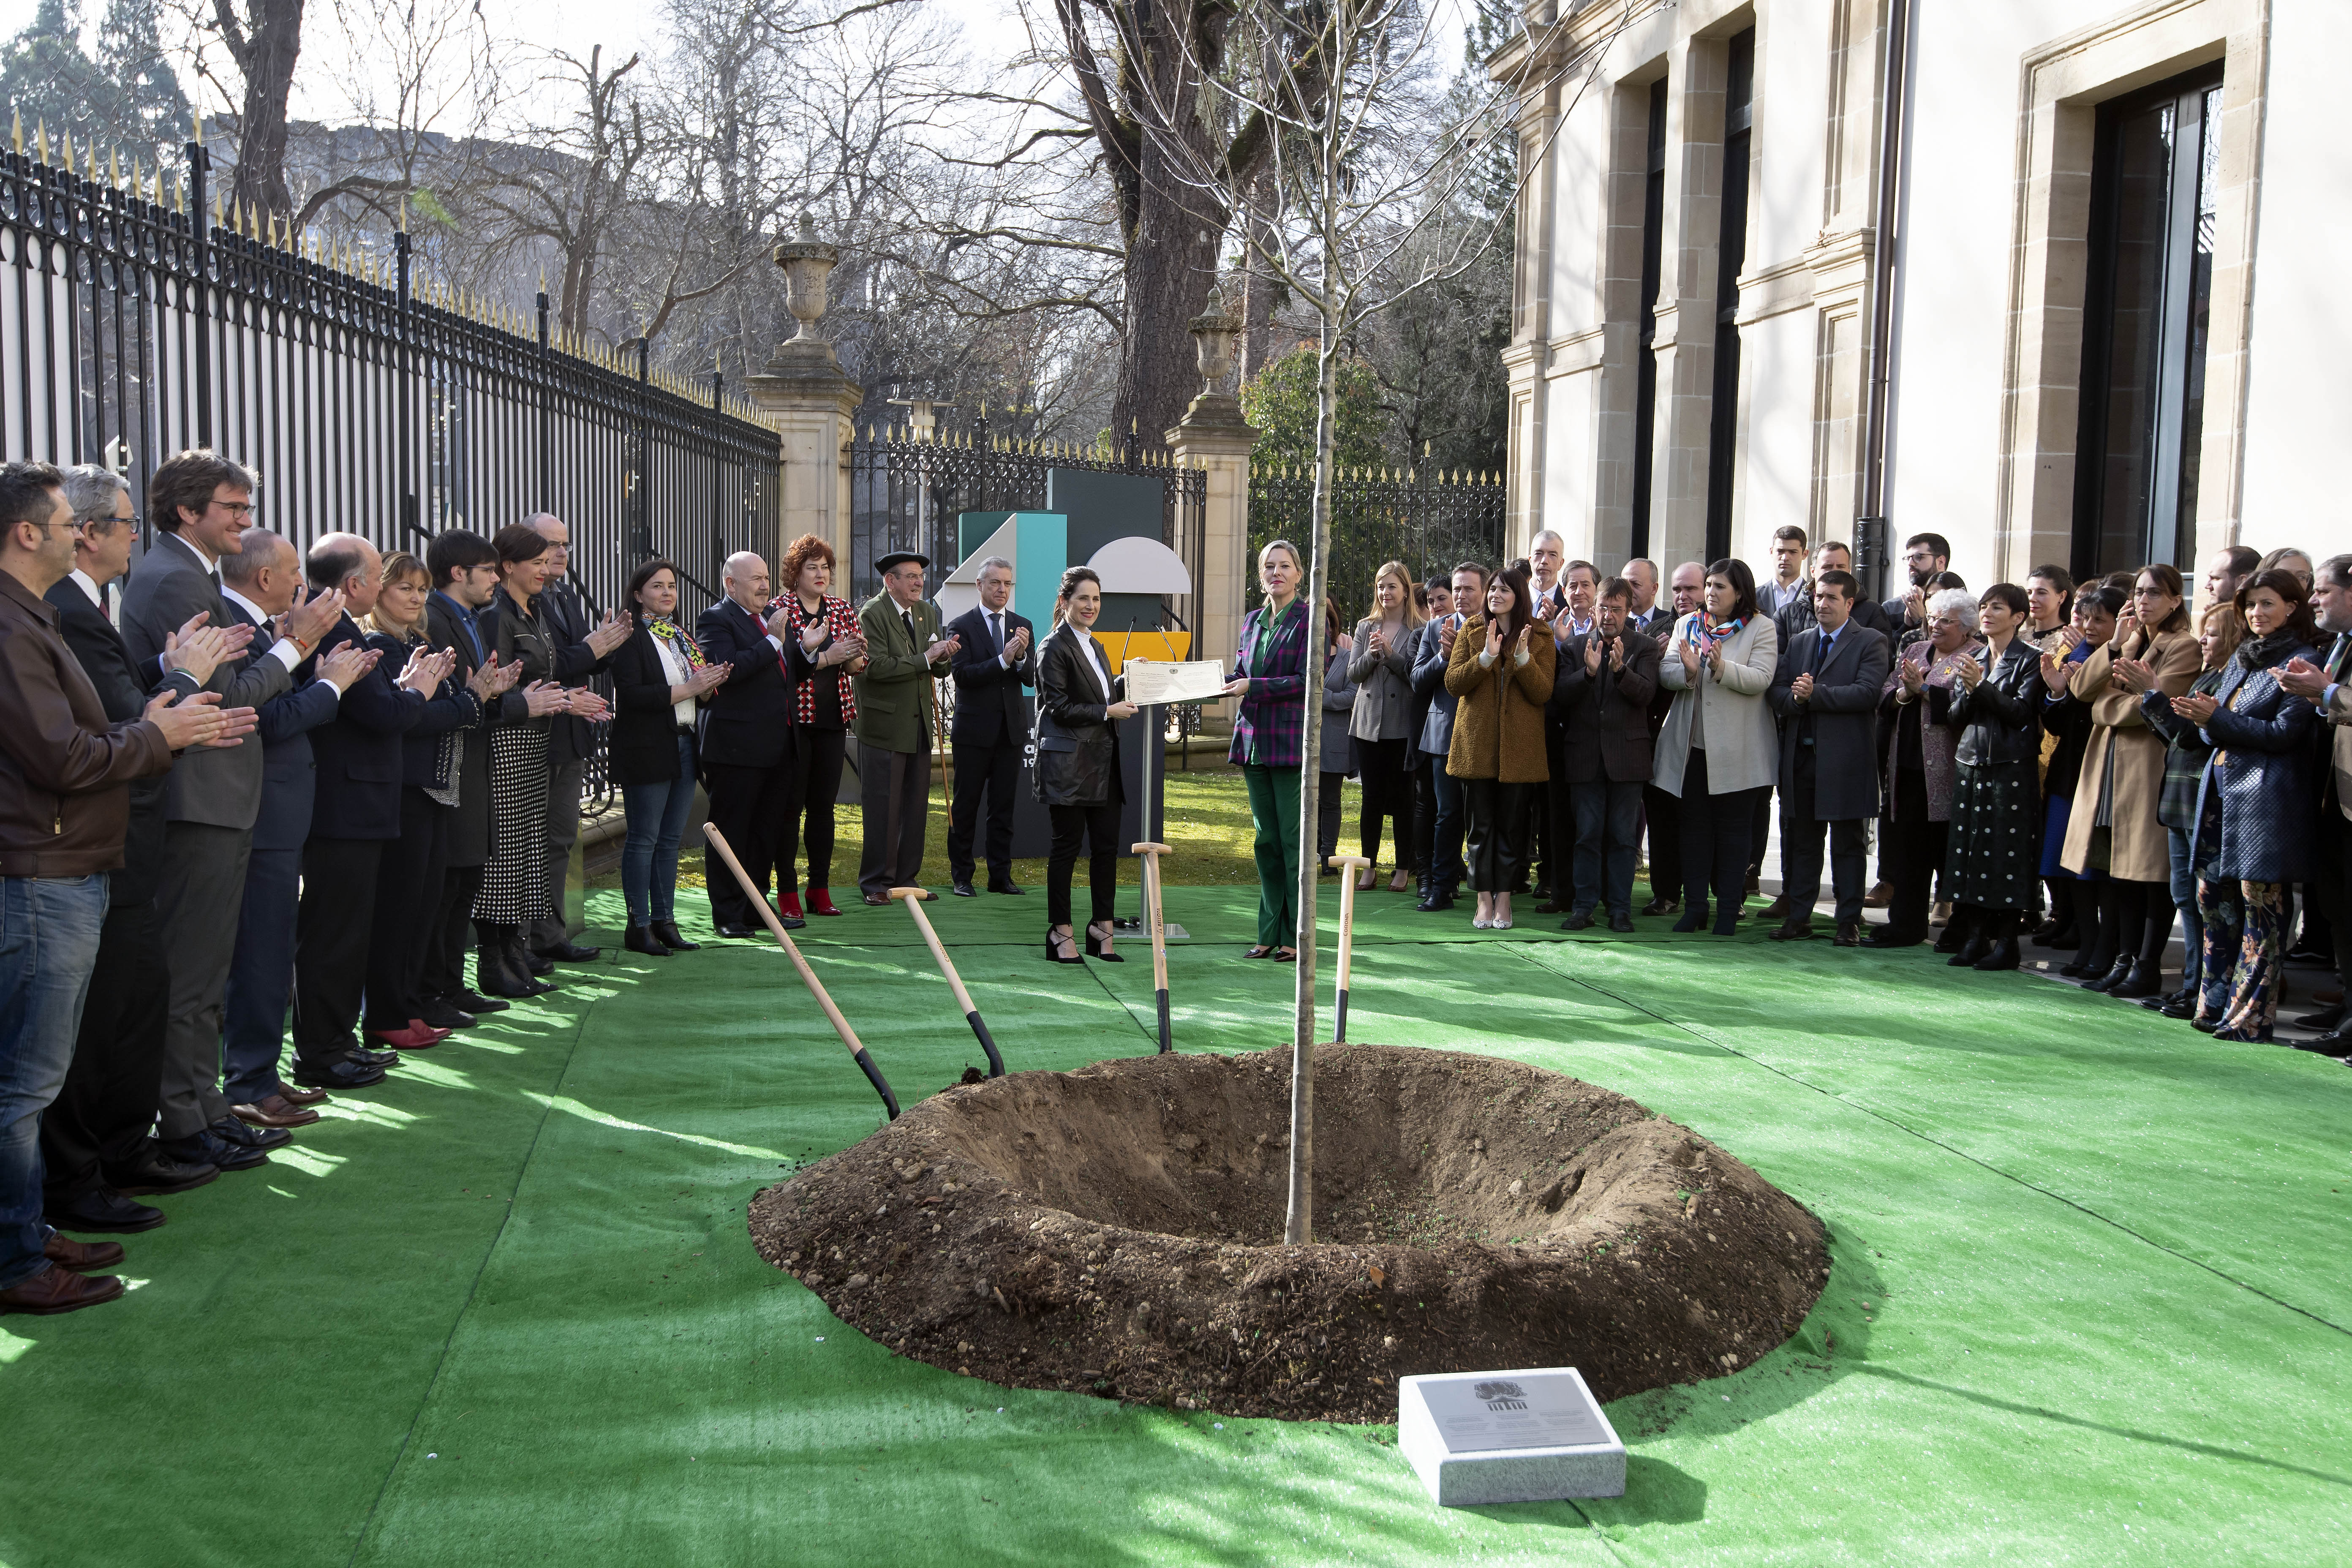 2020_02_03_lhk_arbol_gernika_parlamento_02.jpg